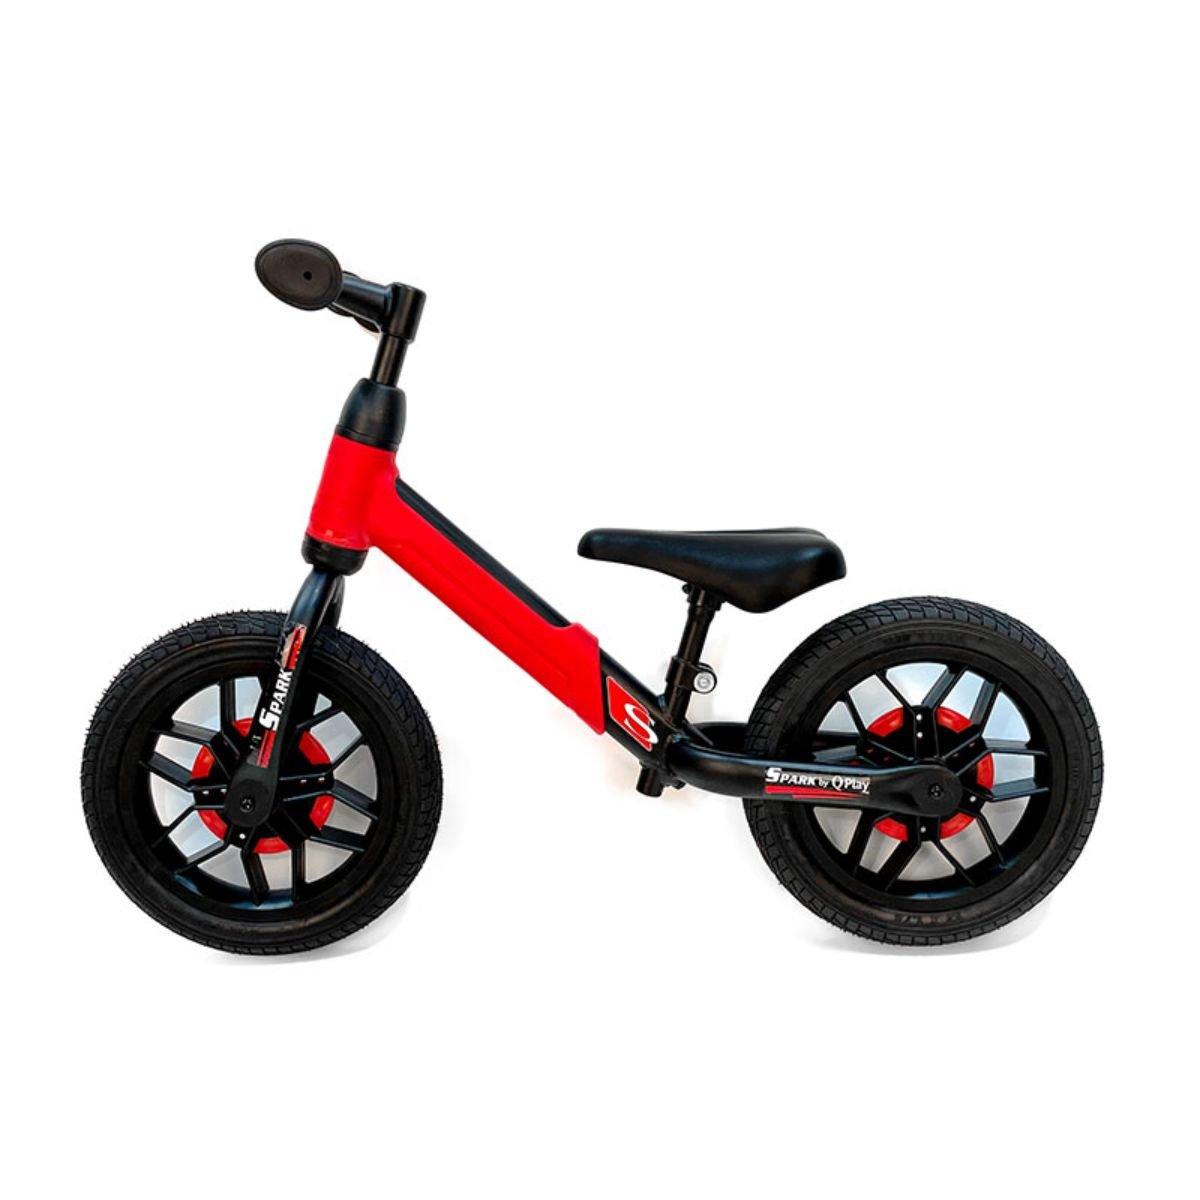 Bicicleta fara pedale DHS Baby Qplay Spark, Rosu, 12 inch